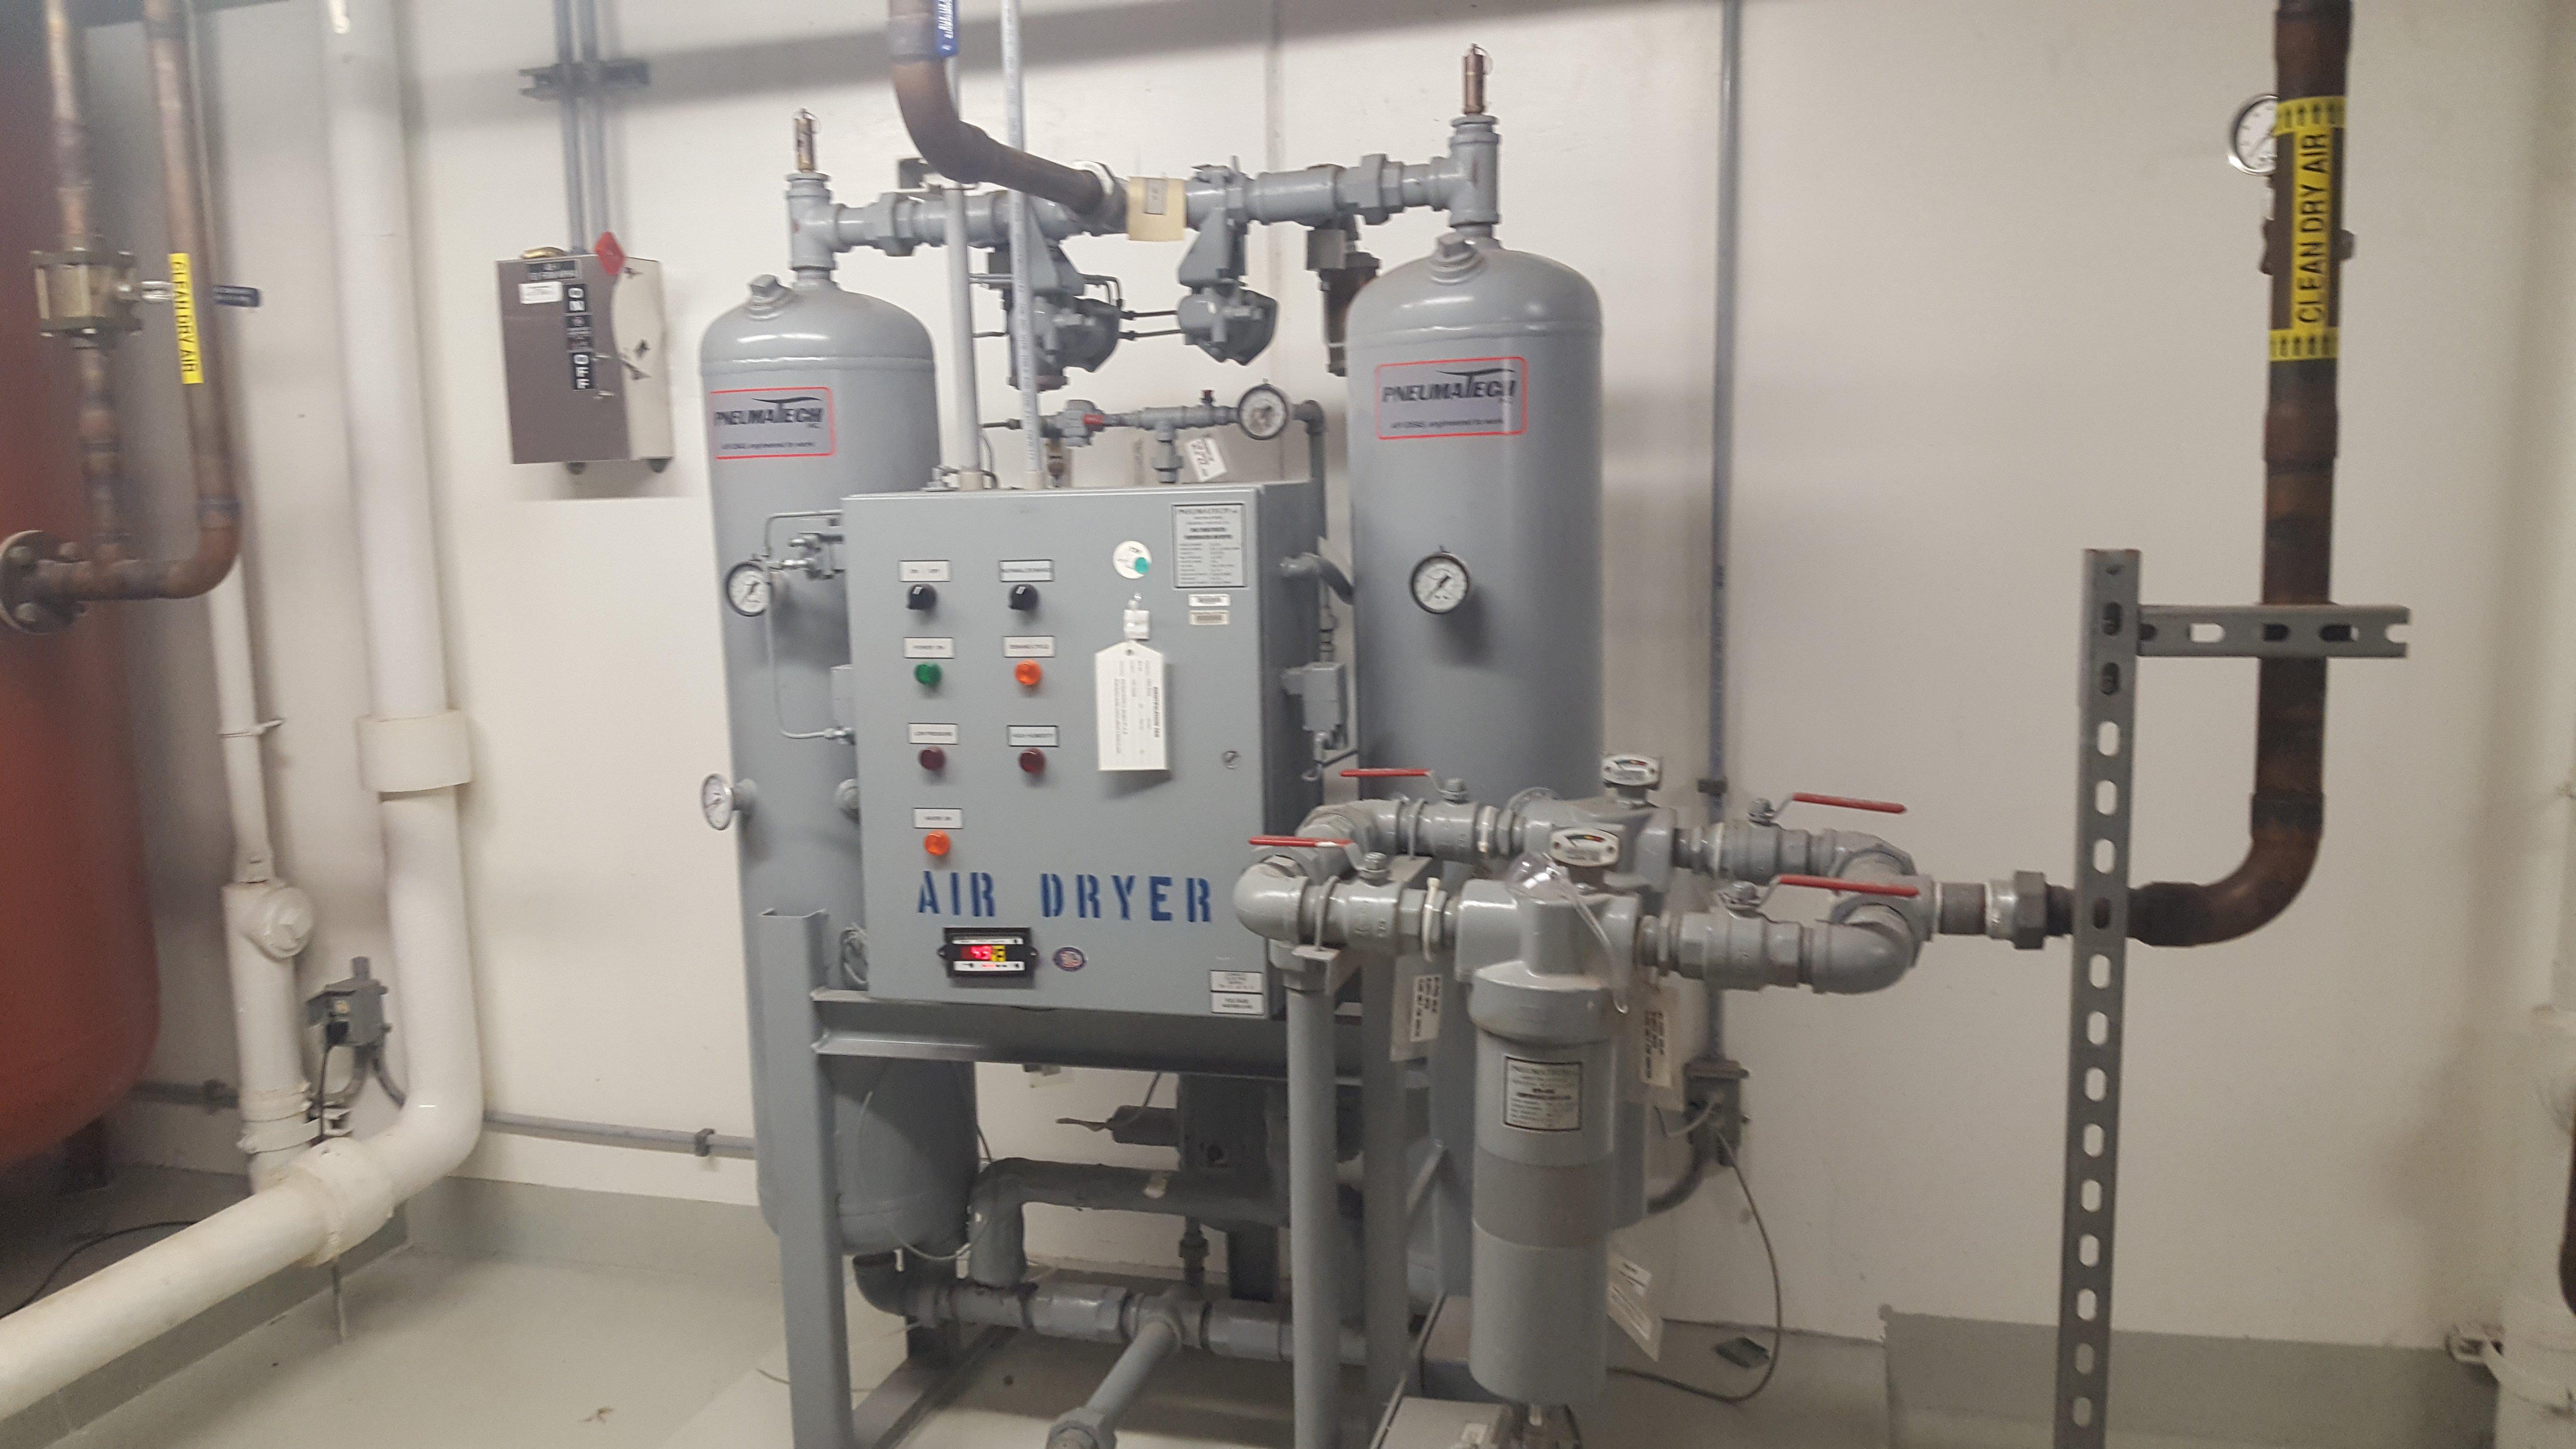 200 CFM Used Air Dryer | Pneumatech Desiccant Air Dryer PE-200